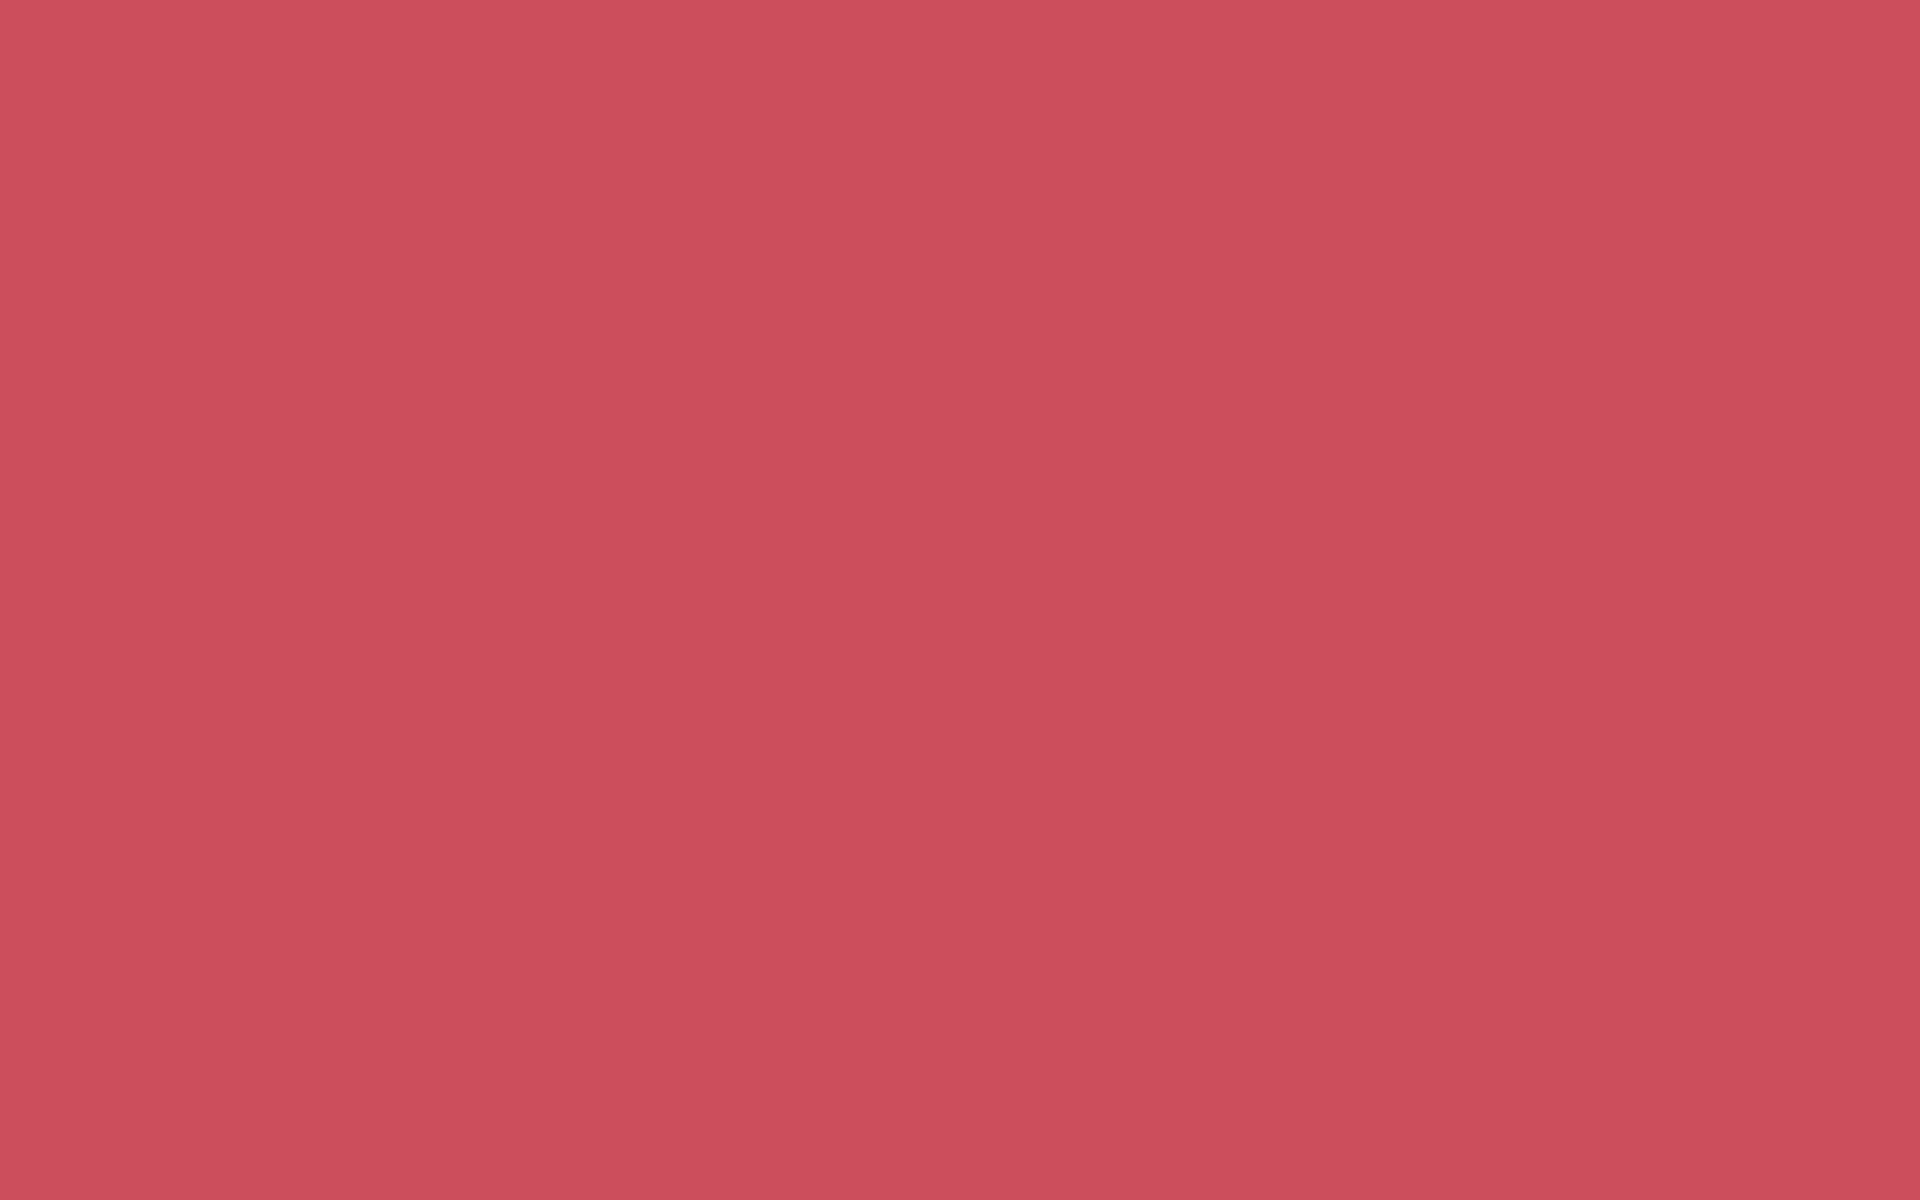 1920x1200 Dark Terra Cotta Solid Color Background